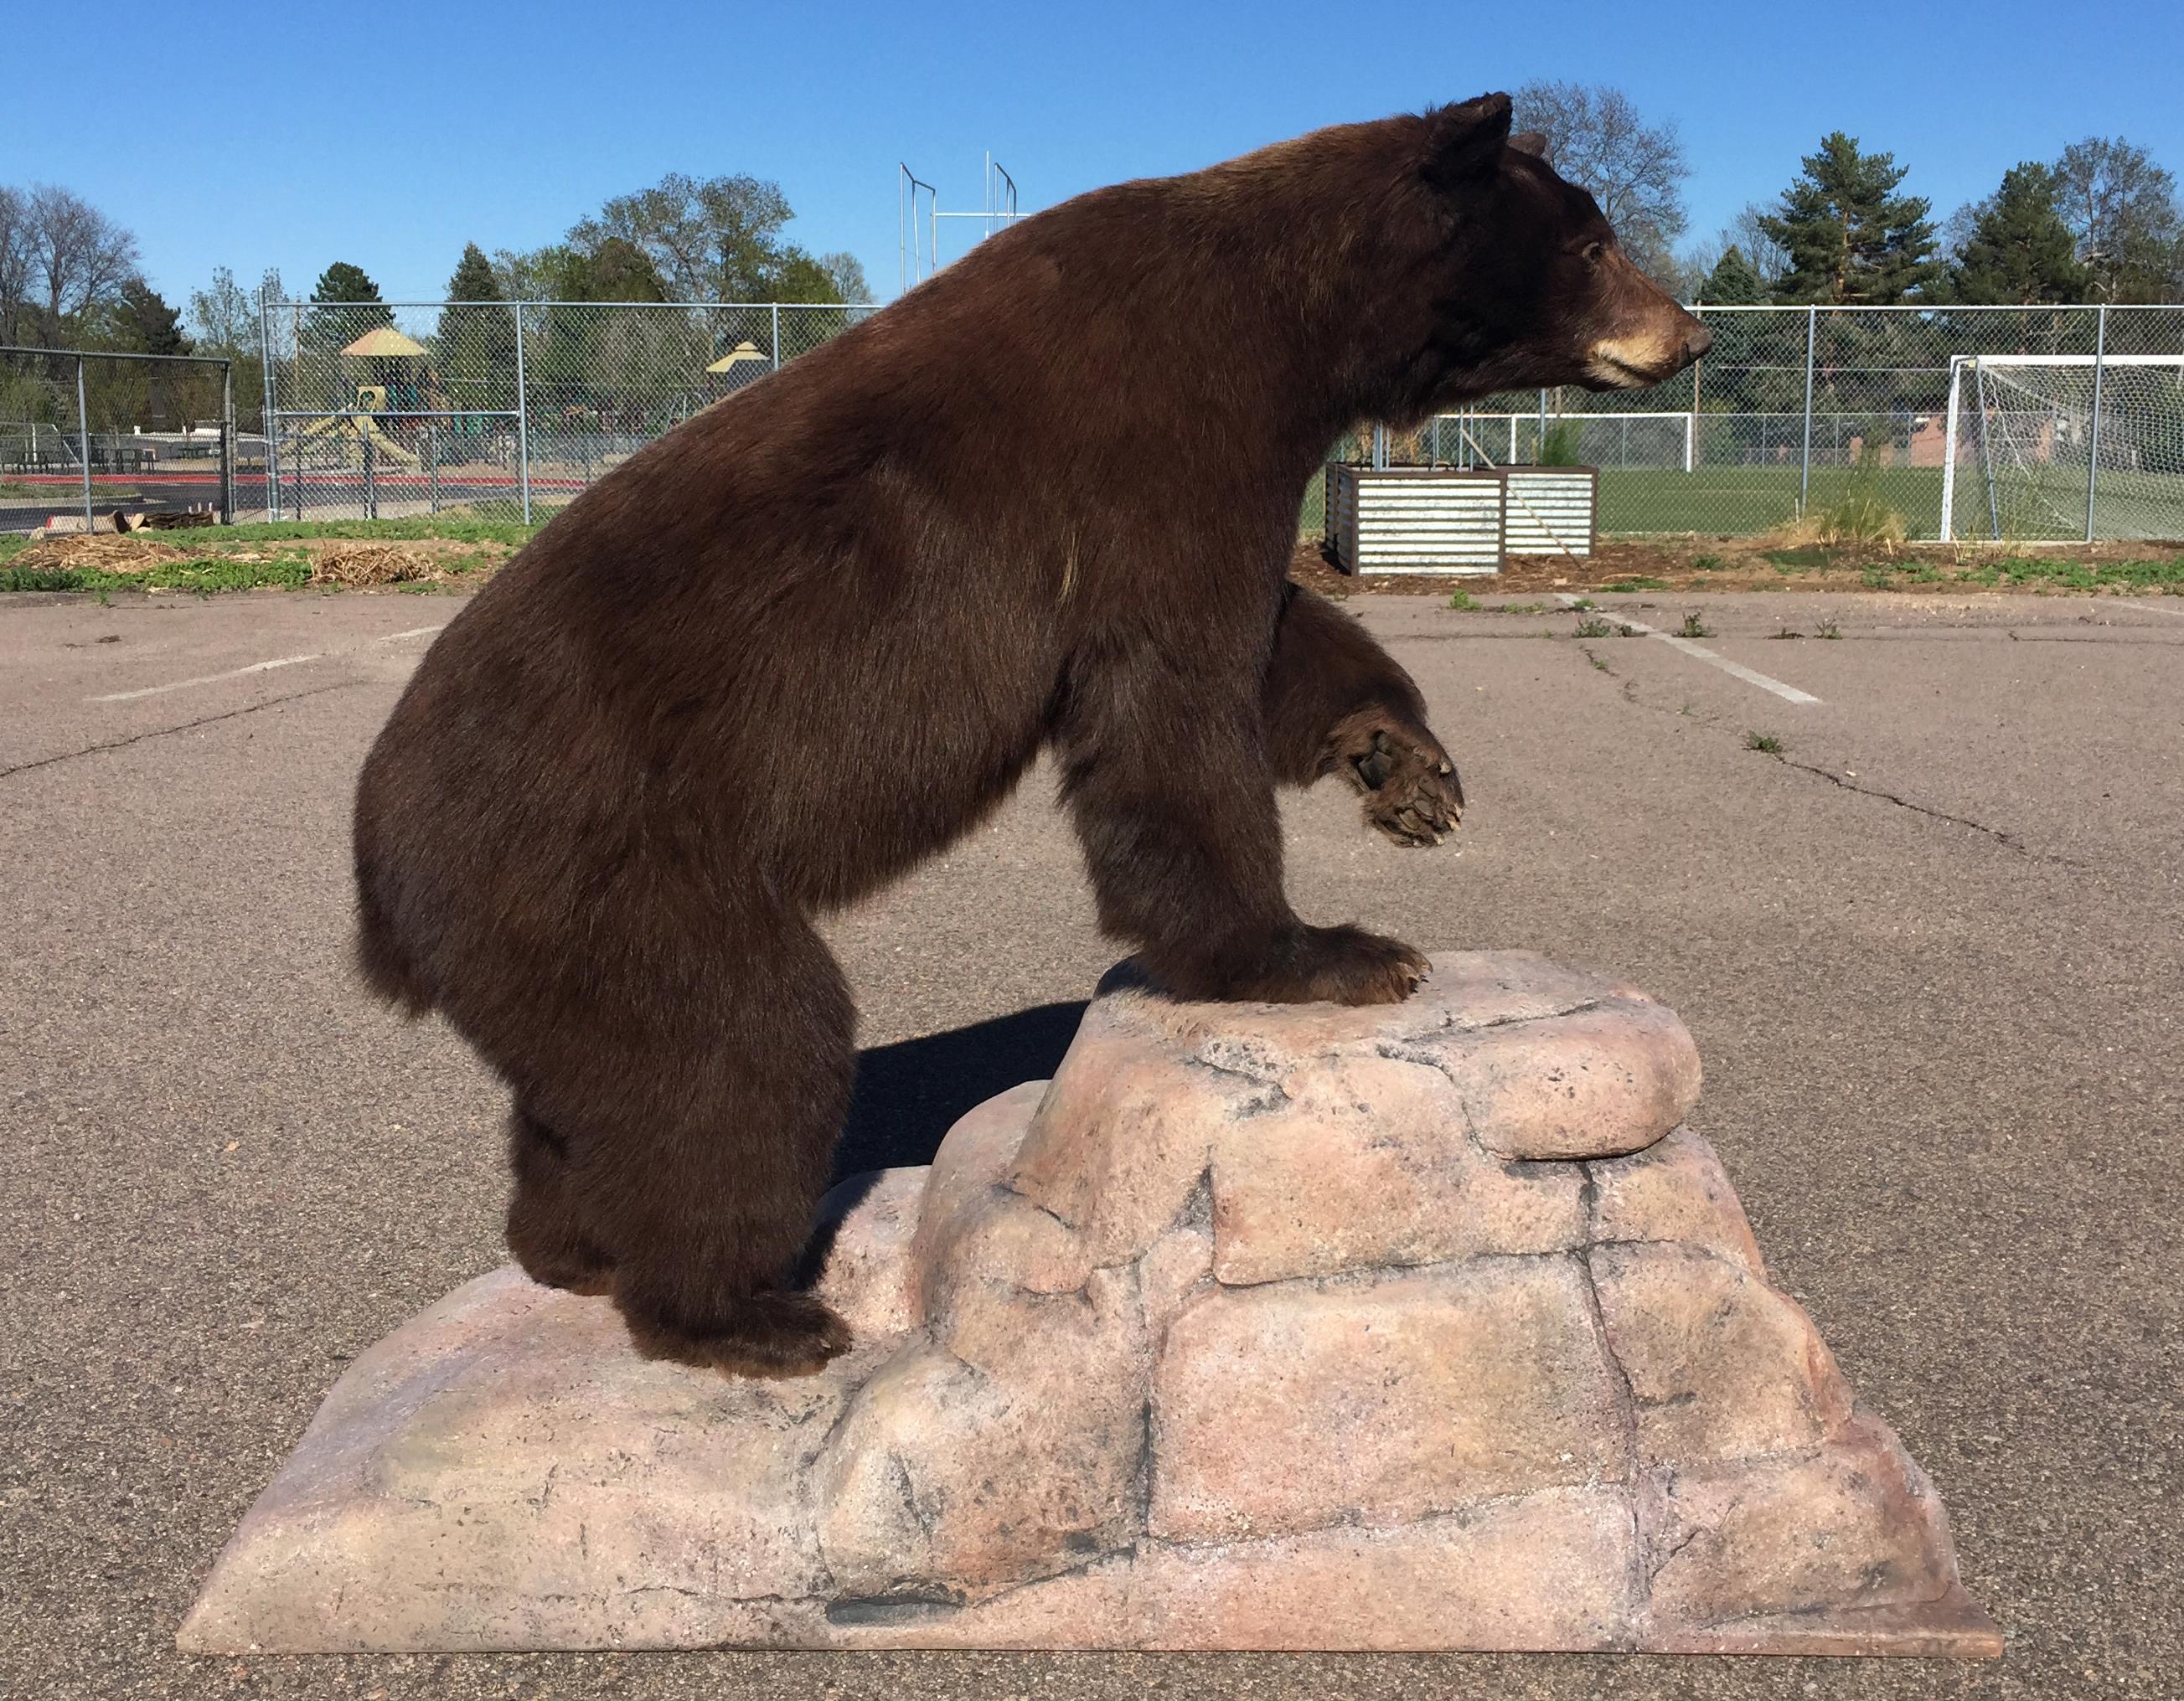 False rock, bear taxidermy base